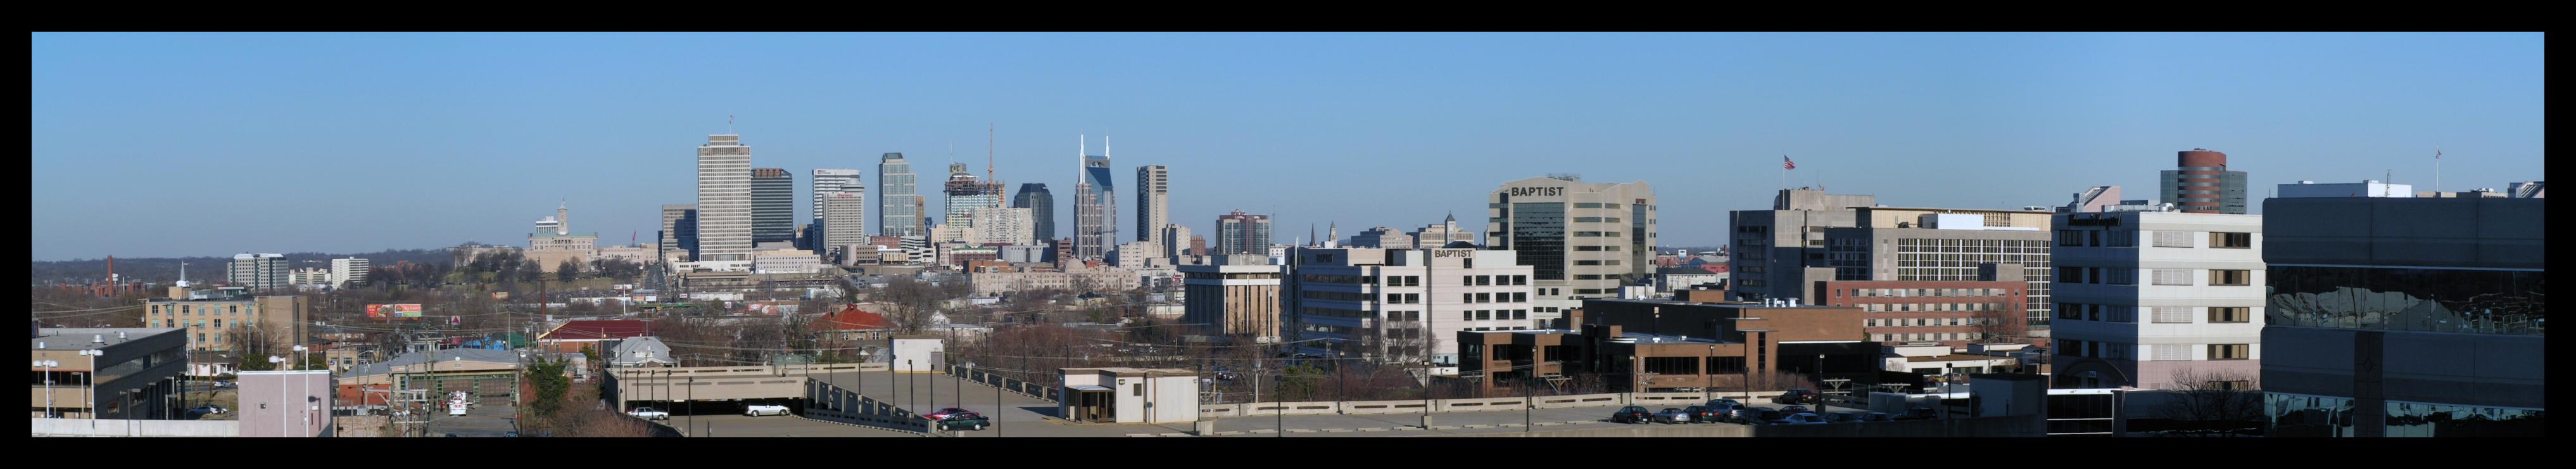 Nashville Pano